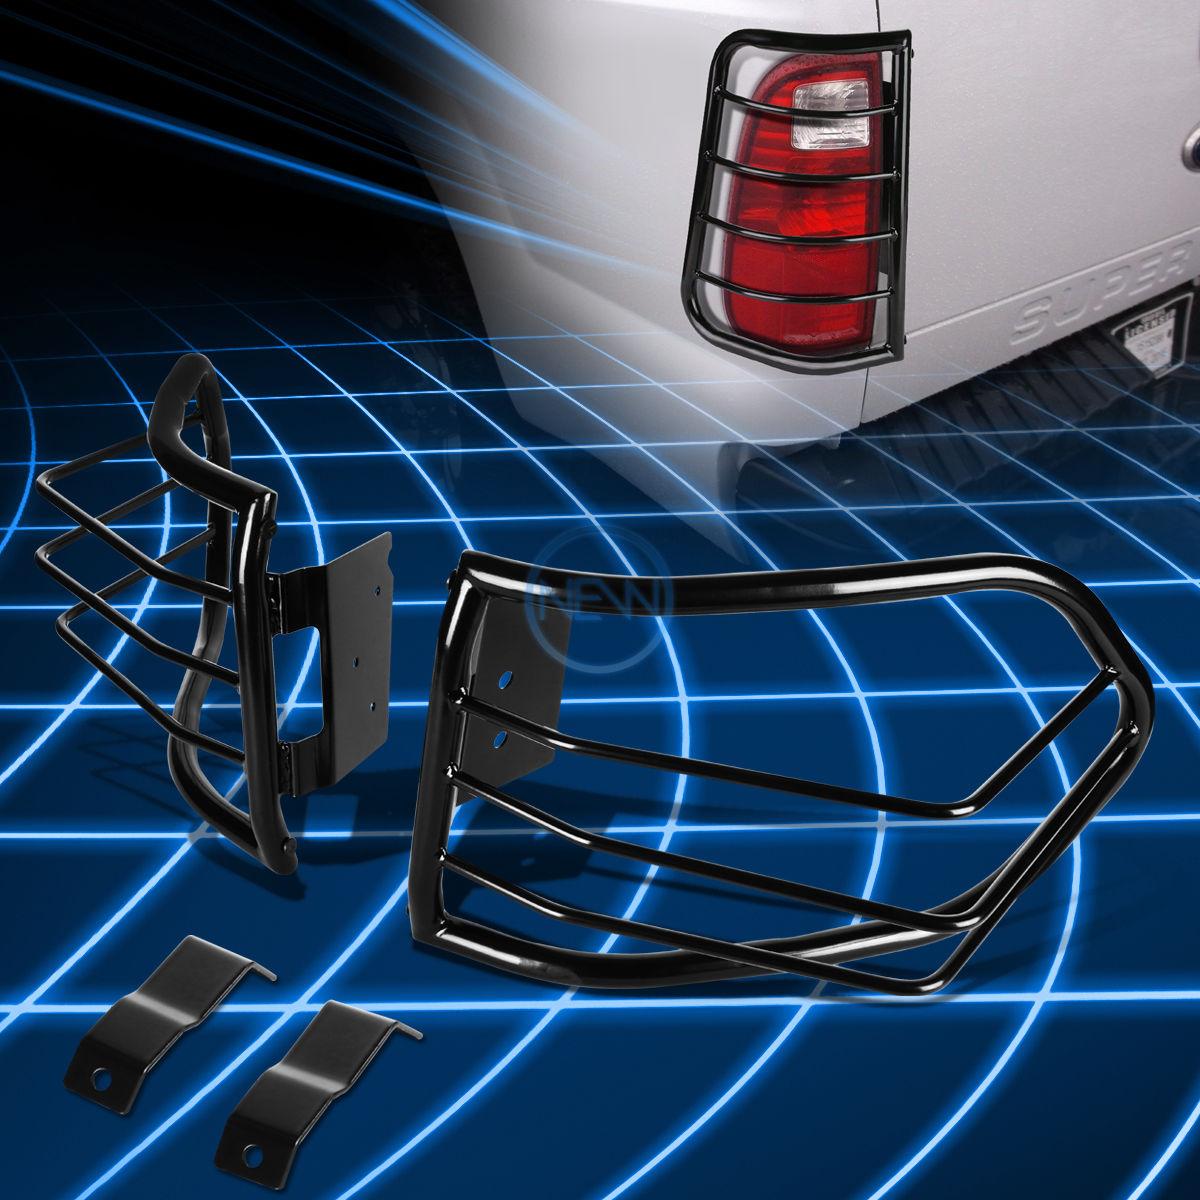 US ライトガード プロテクター トヨタFJクルーザーSUVをカバーするブラックスチールテールライトガードプロテクターカバー Black Steel Tail Light Guard Protector Cover for 2007-2014 Toyota FJ Cruiser SUV